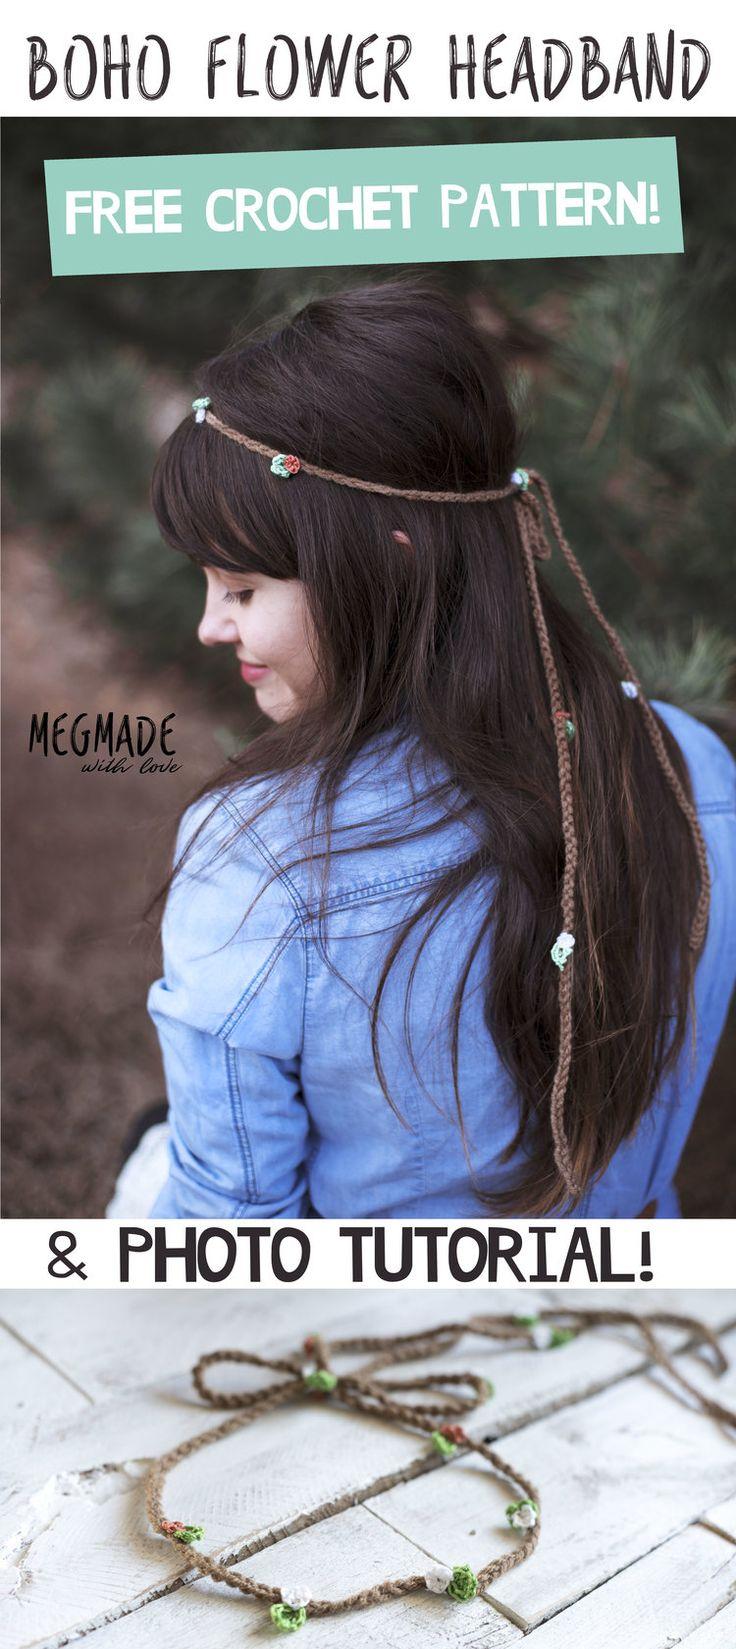 Free Crochet Pattern for an Easy Boho Flower Headband - Megmade with Love